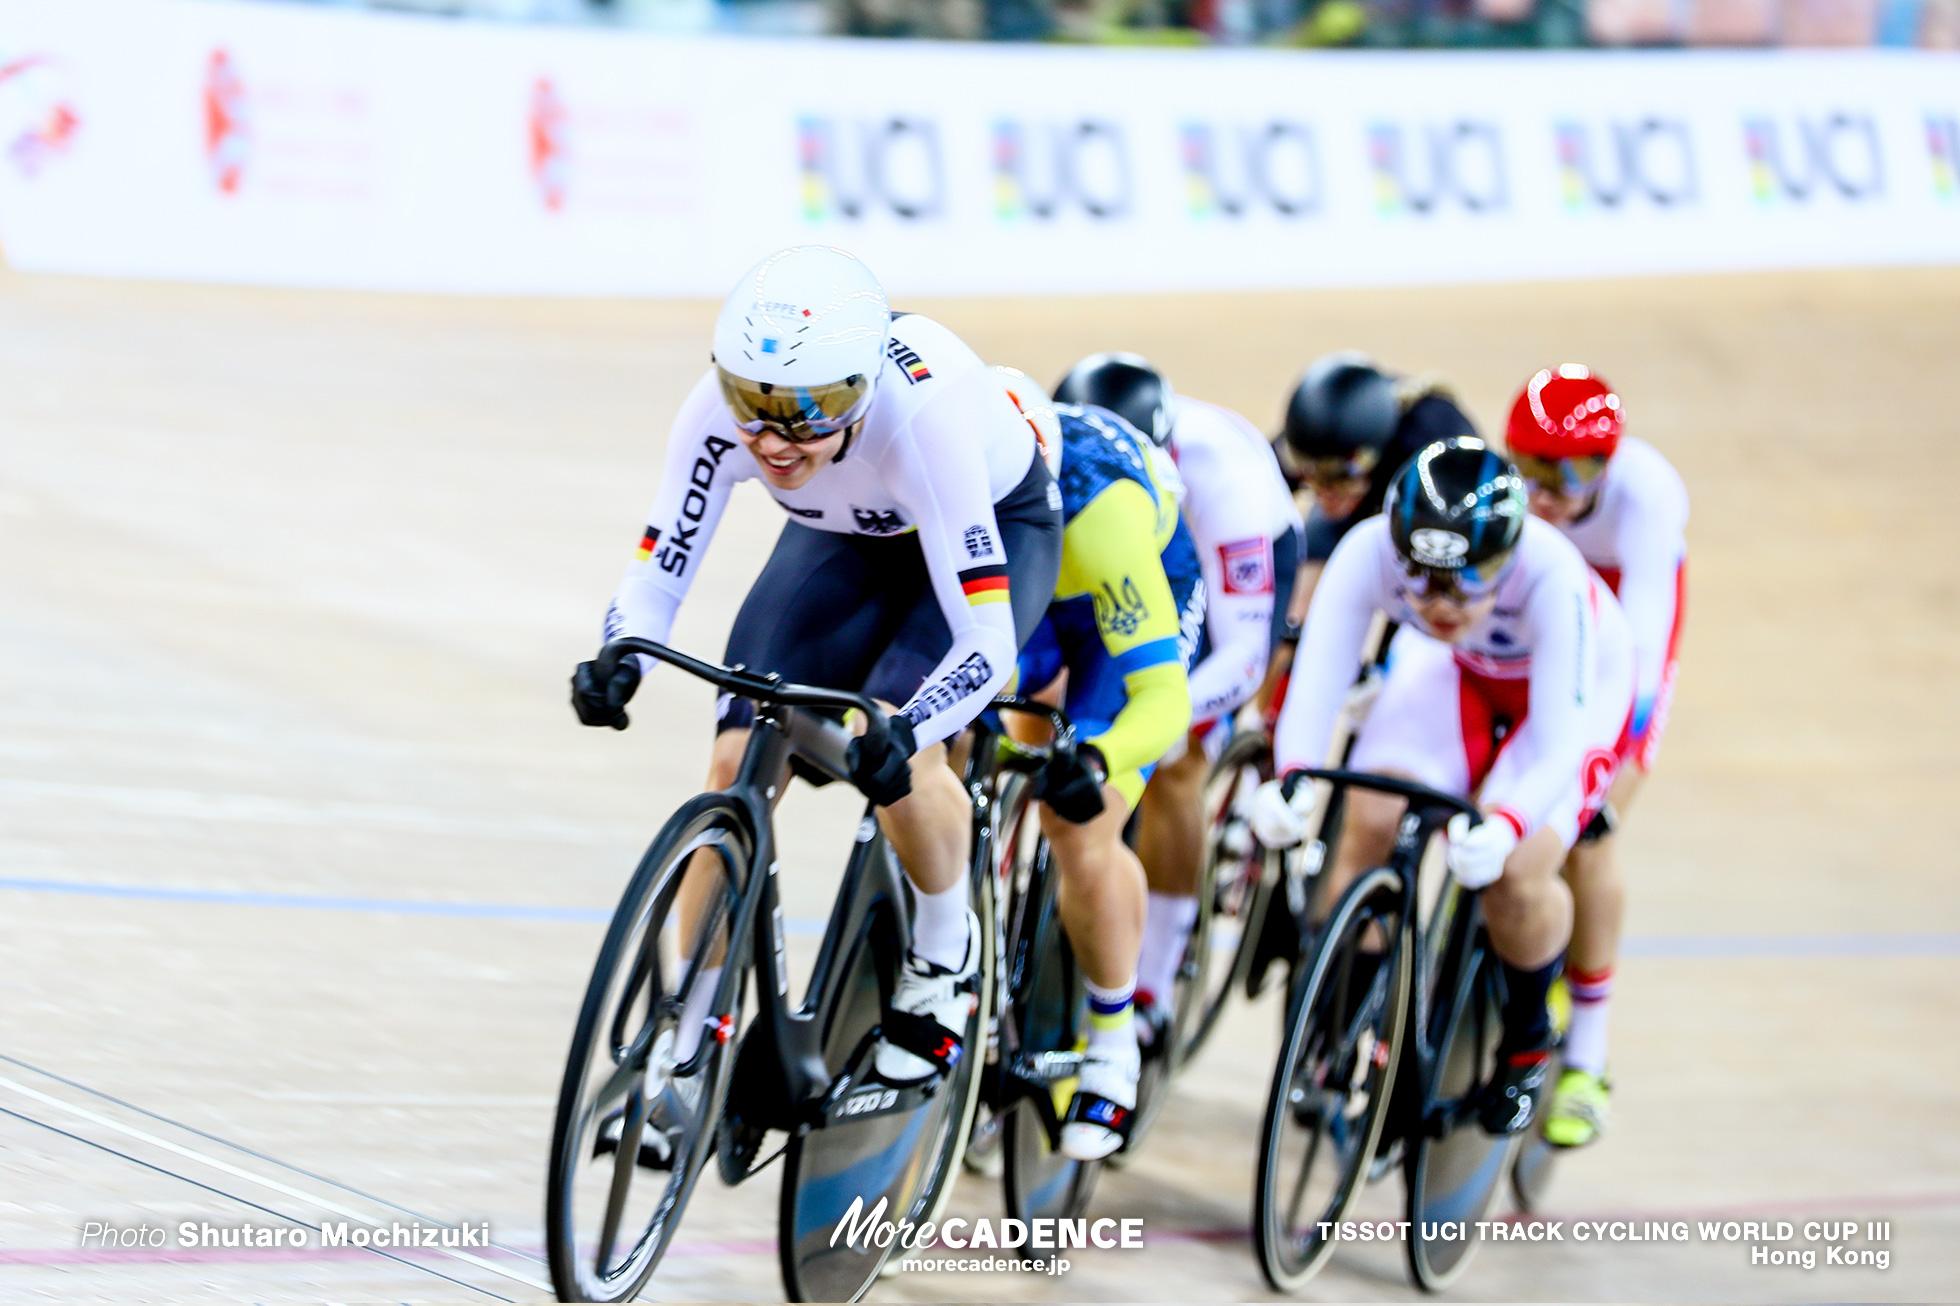 2nd Round / Women's Keirin / TISSOT UCI TRACK CYCLING WORLD CUP III, Hong Kong